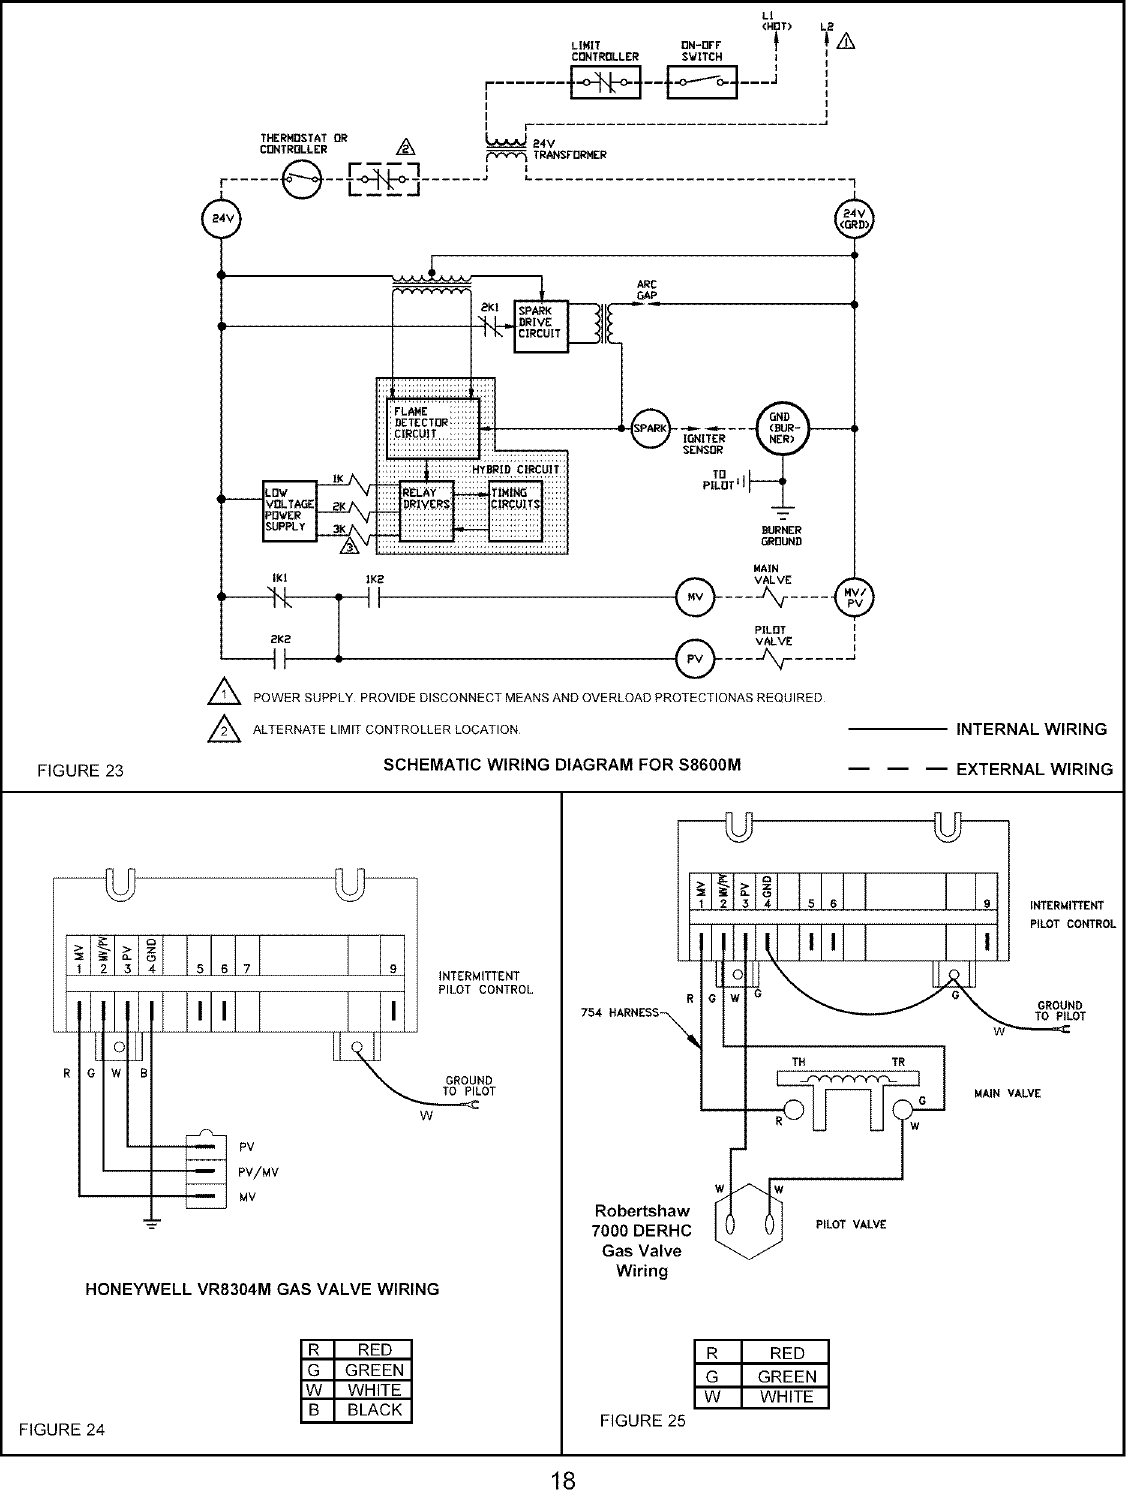 dunkirk boiler manual l0611128 Home Boiler Wiring